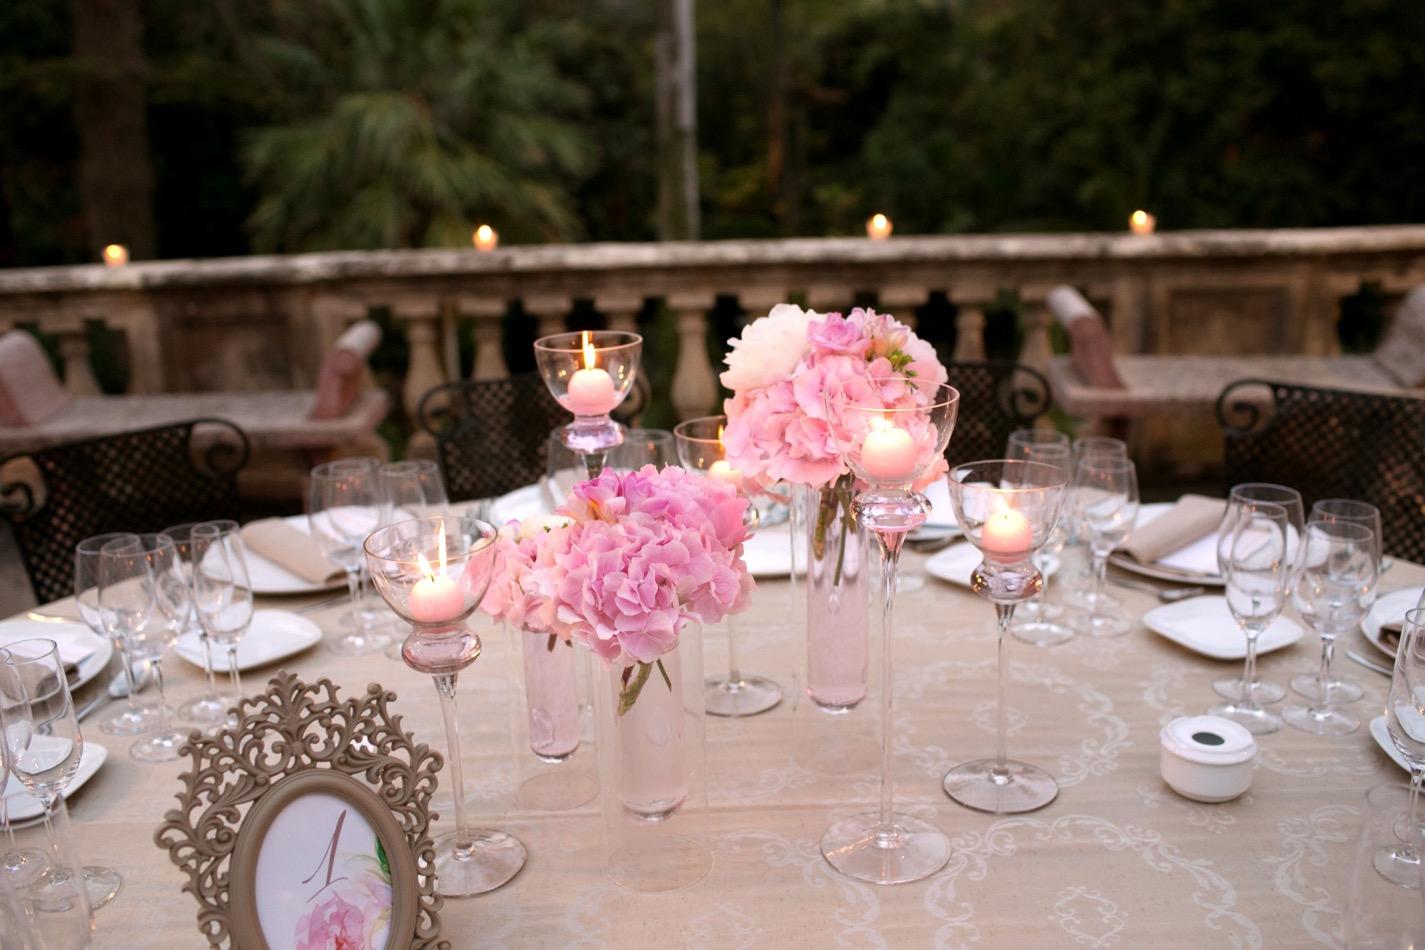 Si-Quiero-Wedding-Planner-By-Sira-Antequera-Vanesa-Jose-35